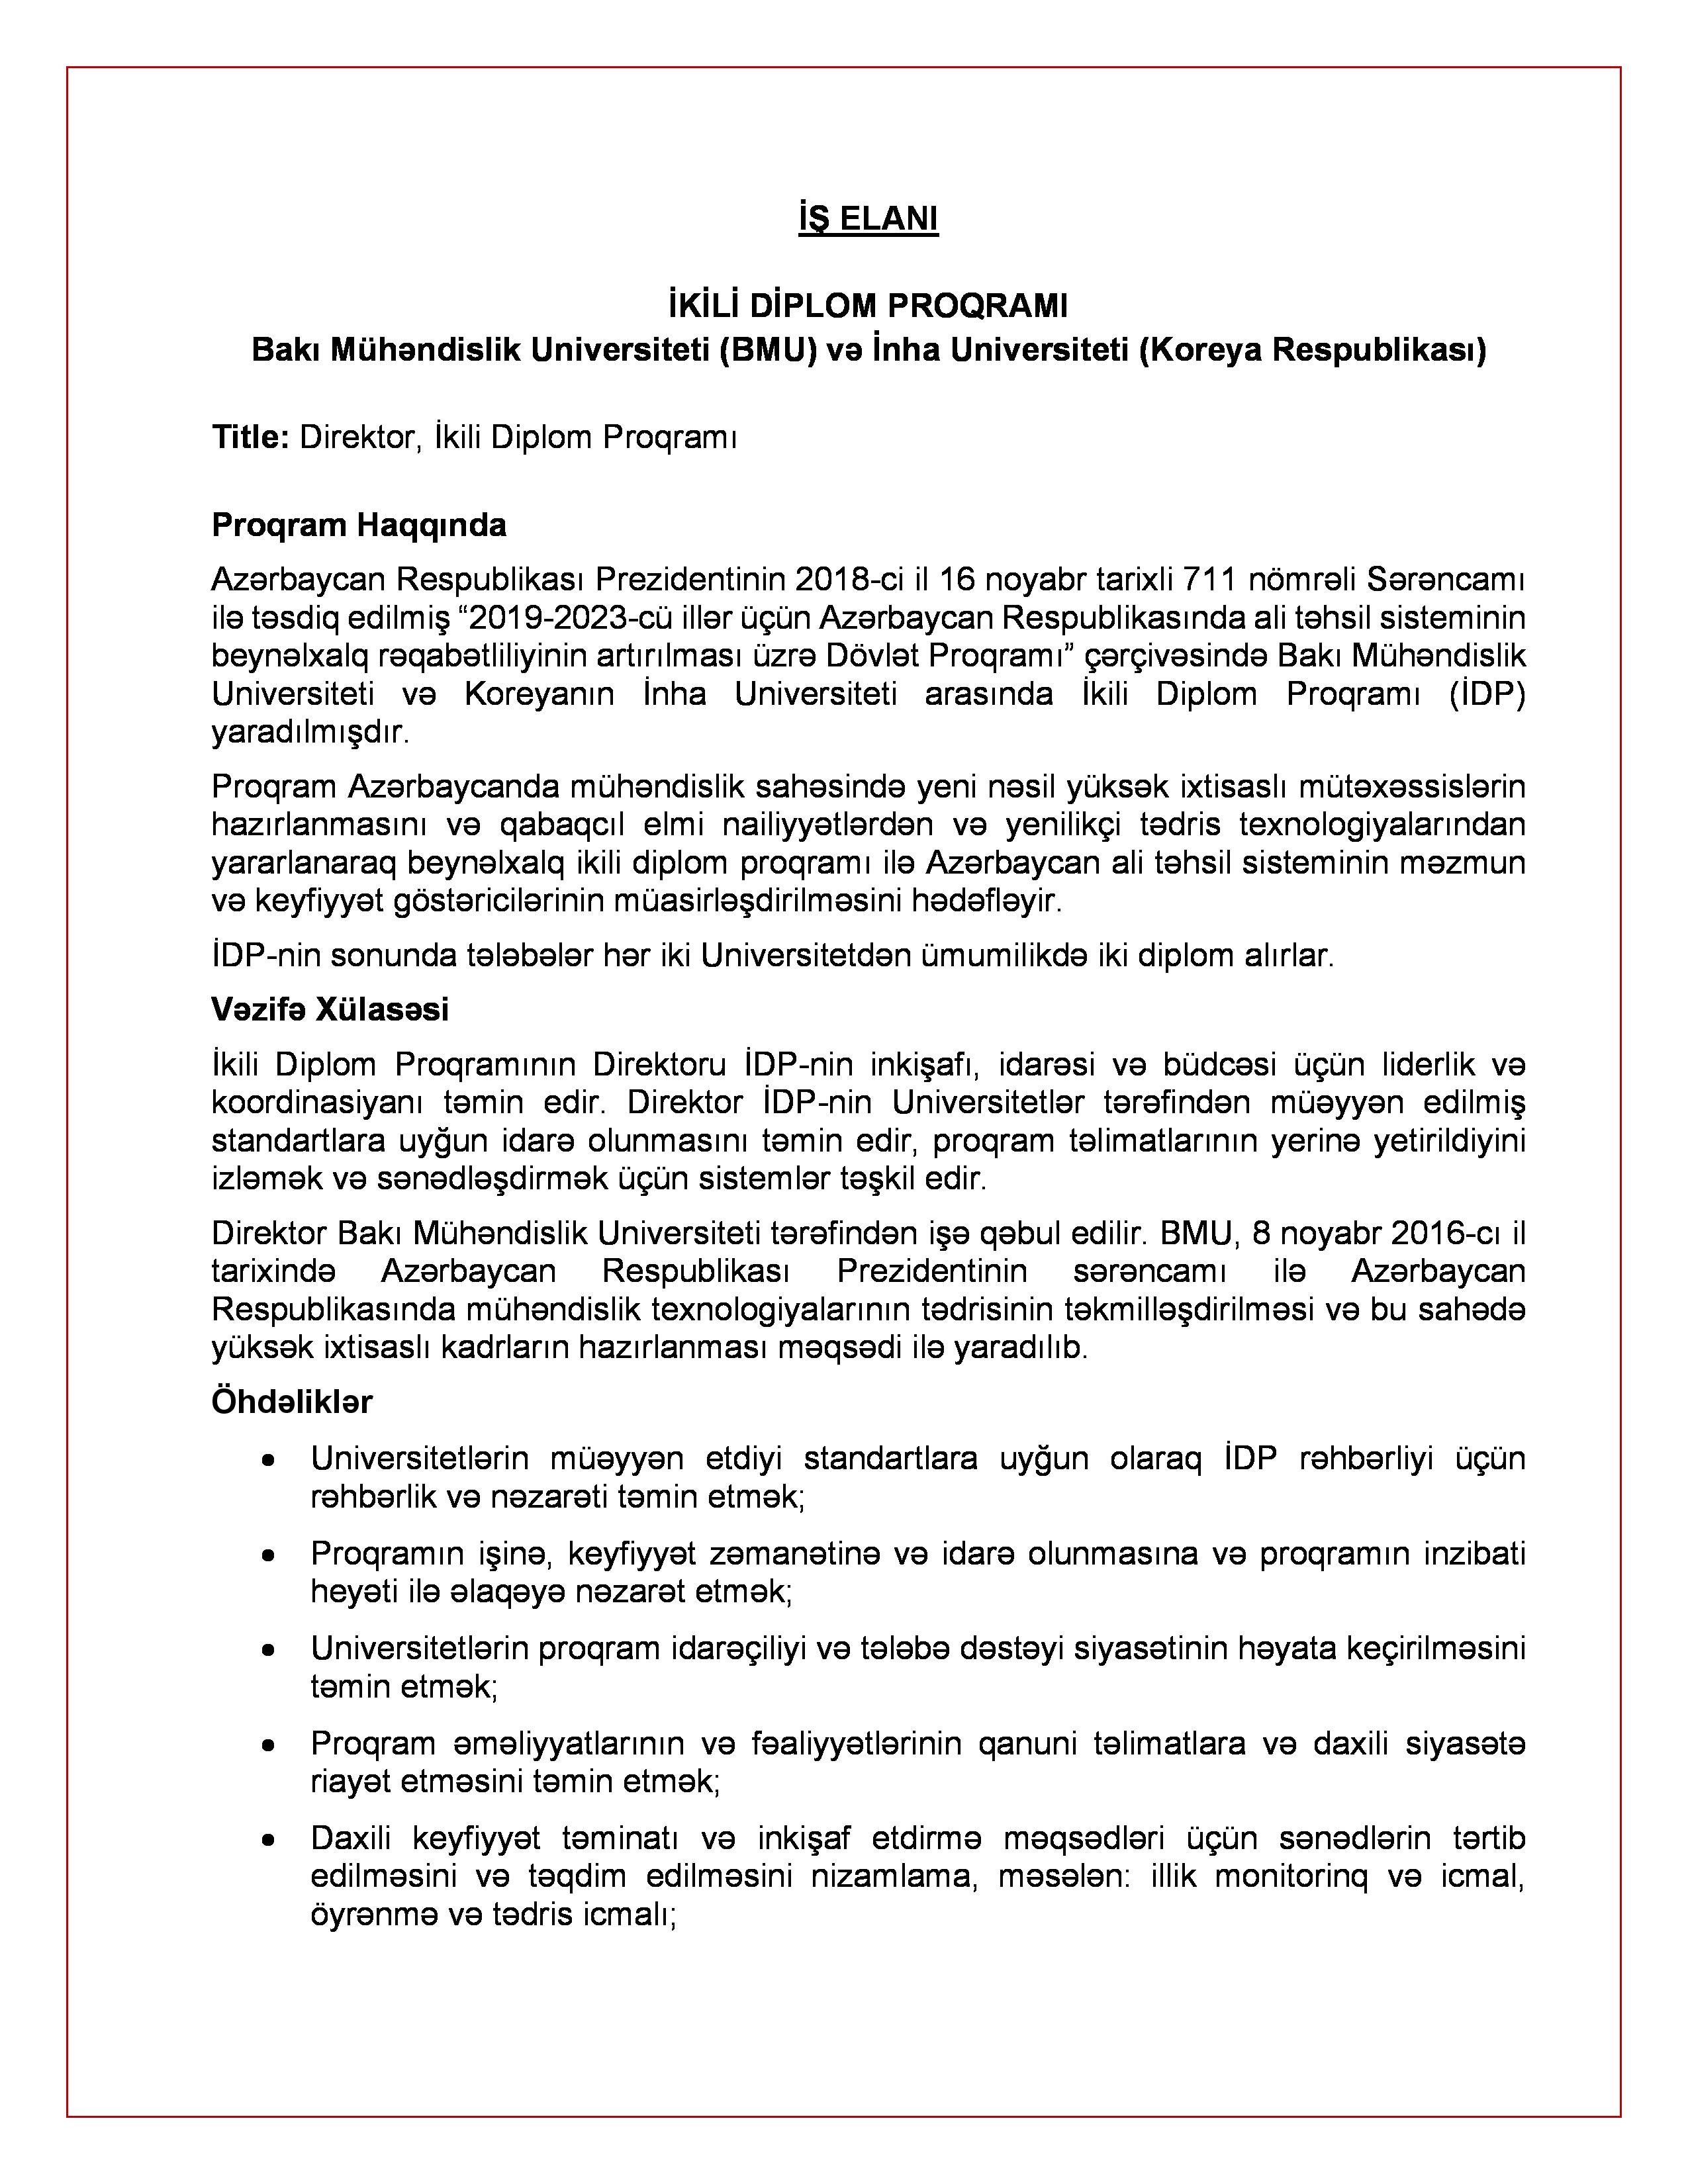 BMU-da ikili diplom proqramına vakansiya elan edilib